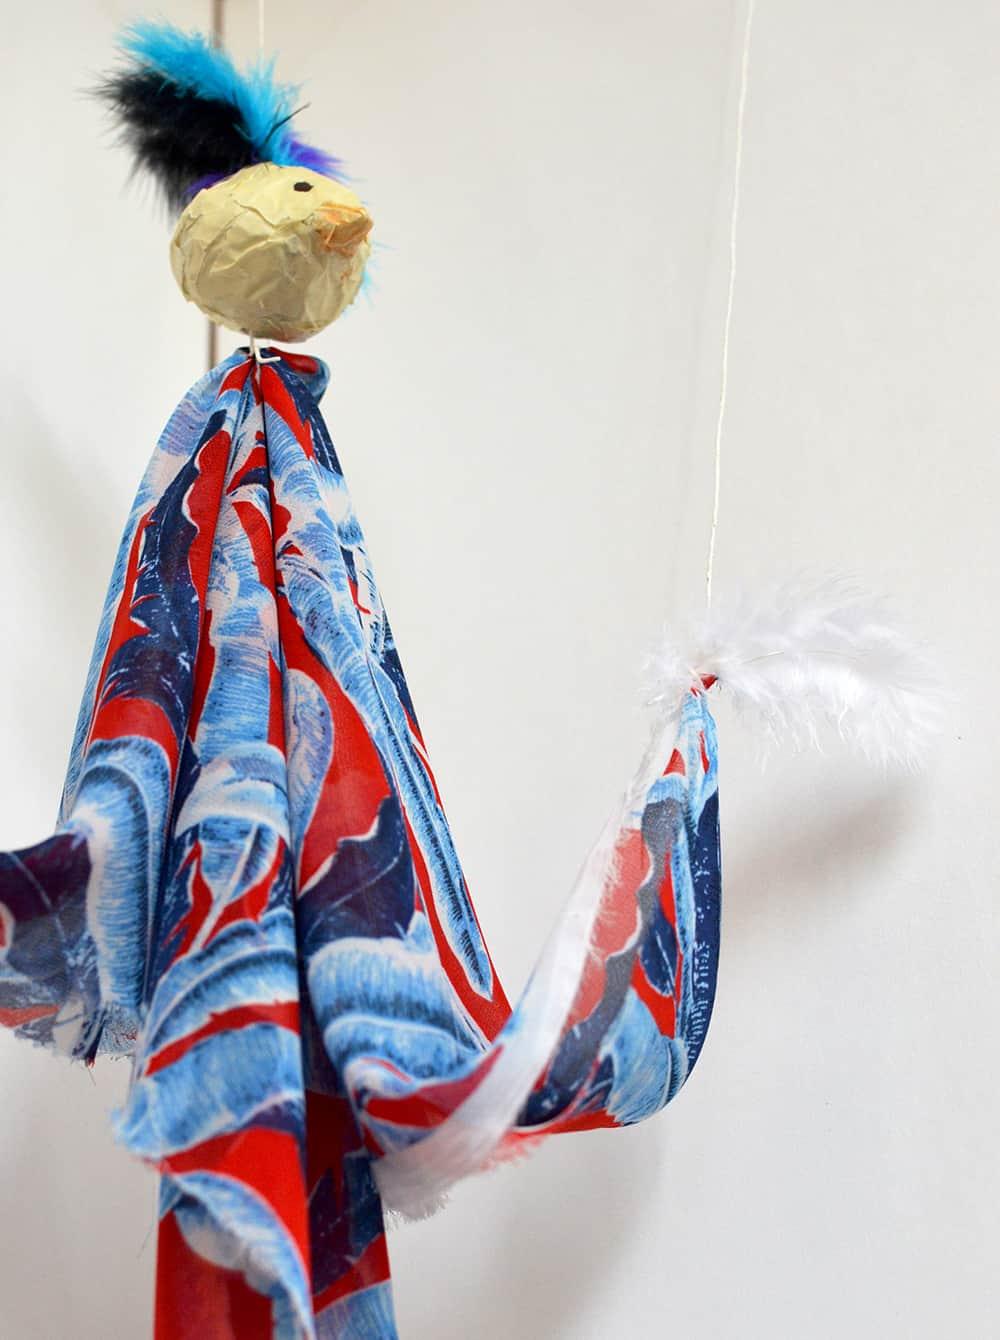 DIY für Kinder: Vogel-Marionette basteln